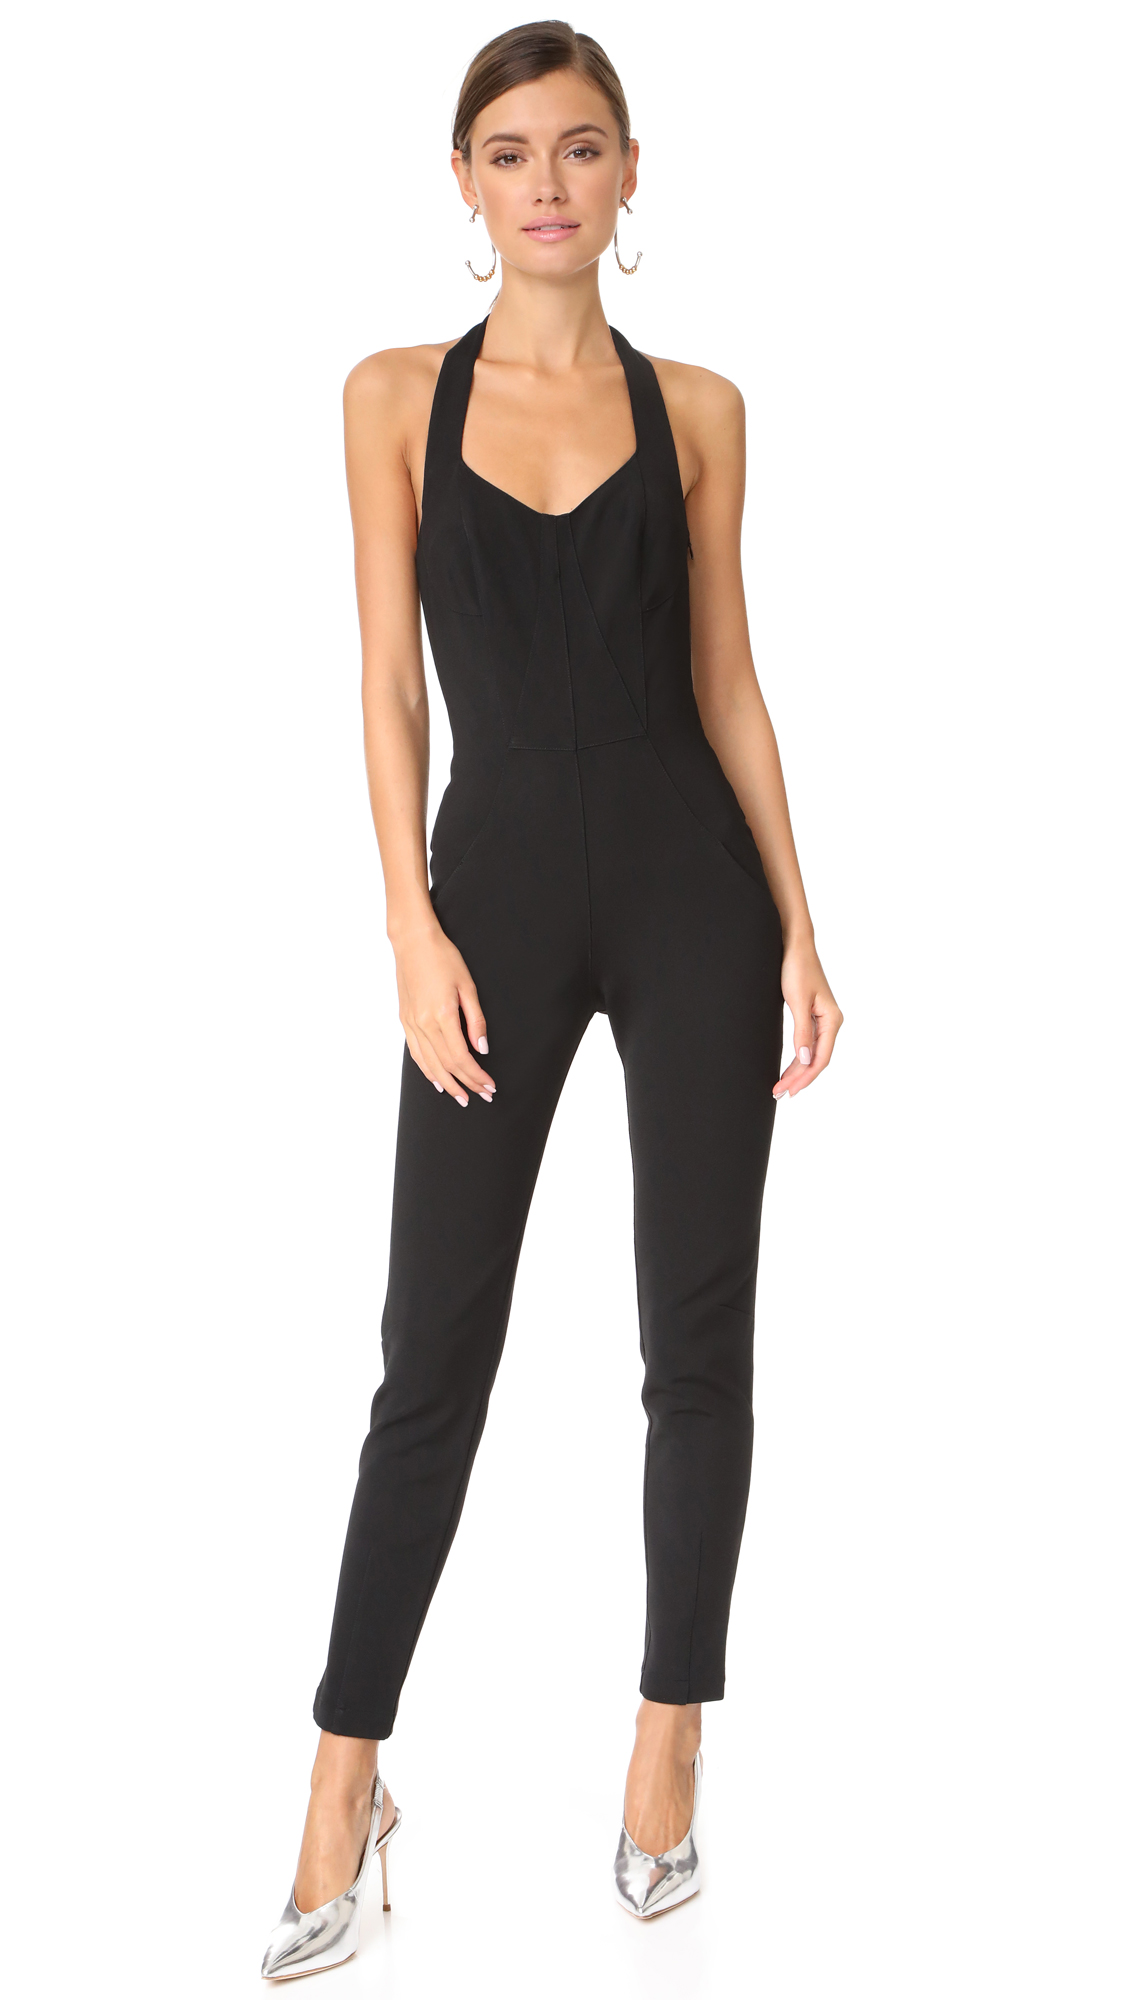 Jonathan Simkhai Bodycon Elastania Jumpsuit - Black